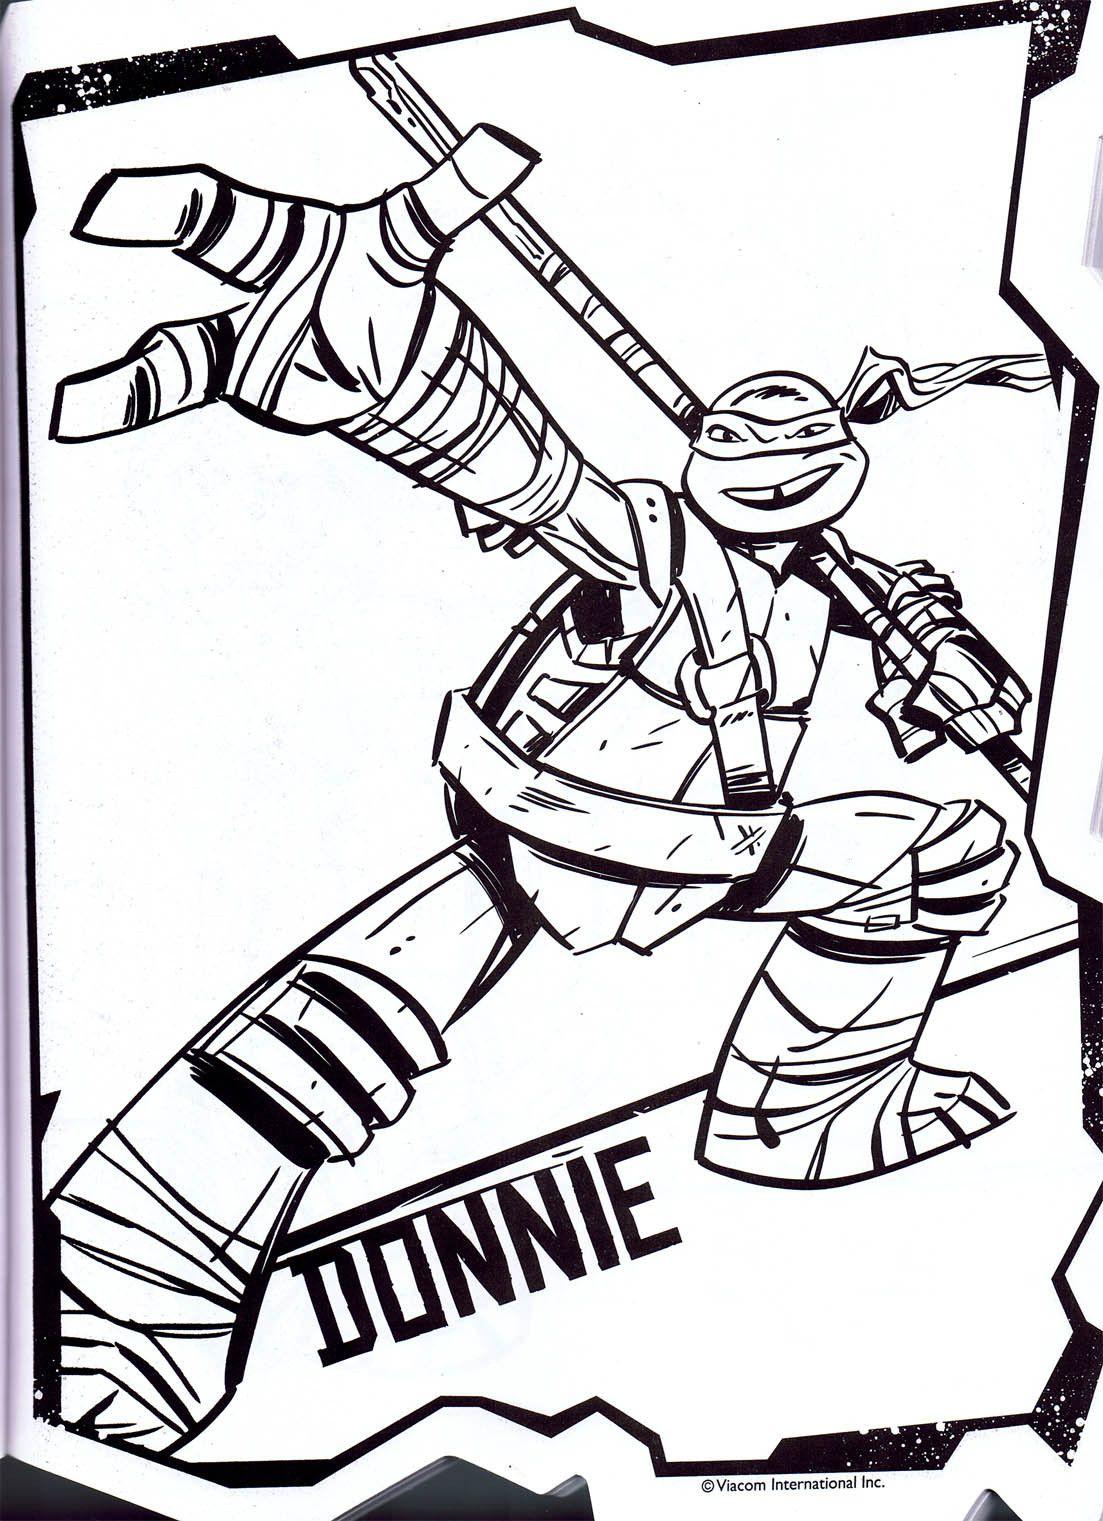 Donatello Ninja Turtle Coloring Page Youngandtae Com Turtle Coloring Pages Ninja Turtle Coloring Pages Cartoon Coloring Pages